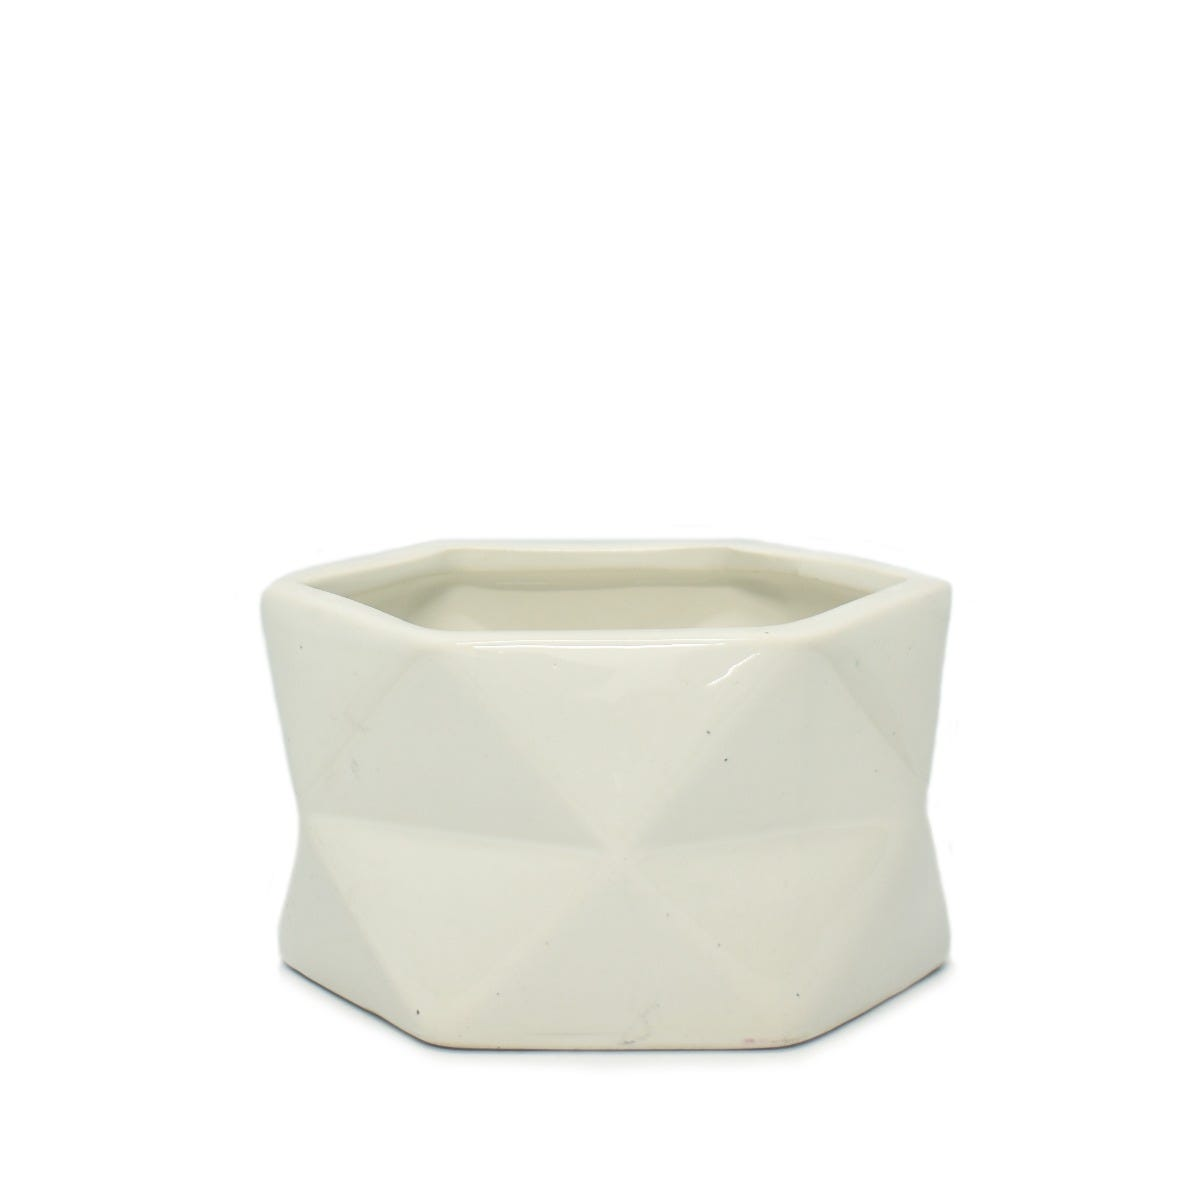 Maceta de cerámica Geométrica en forma de hexágono